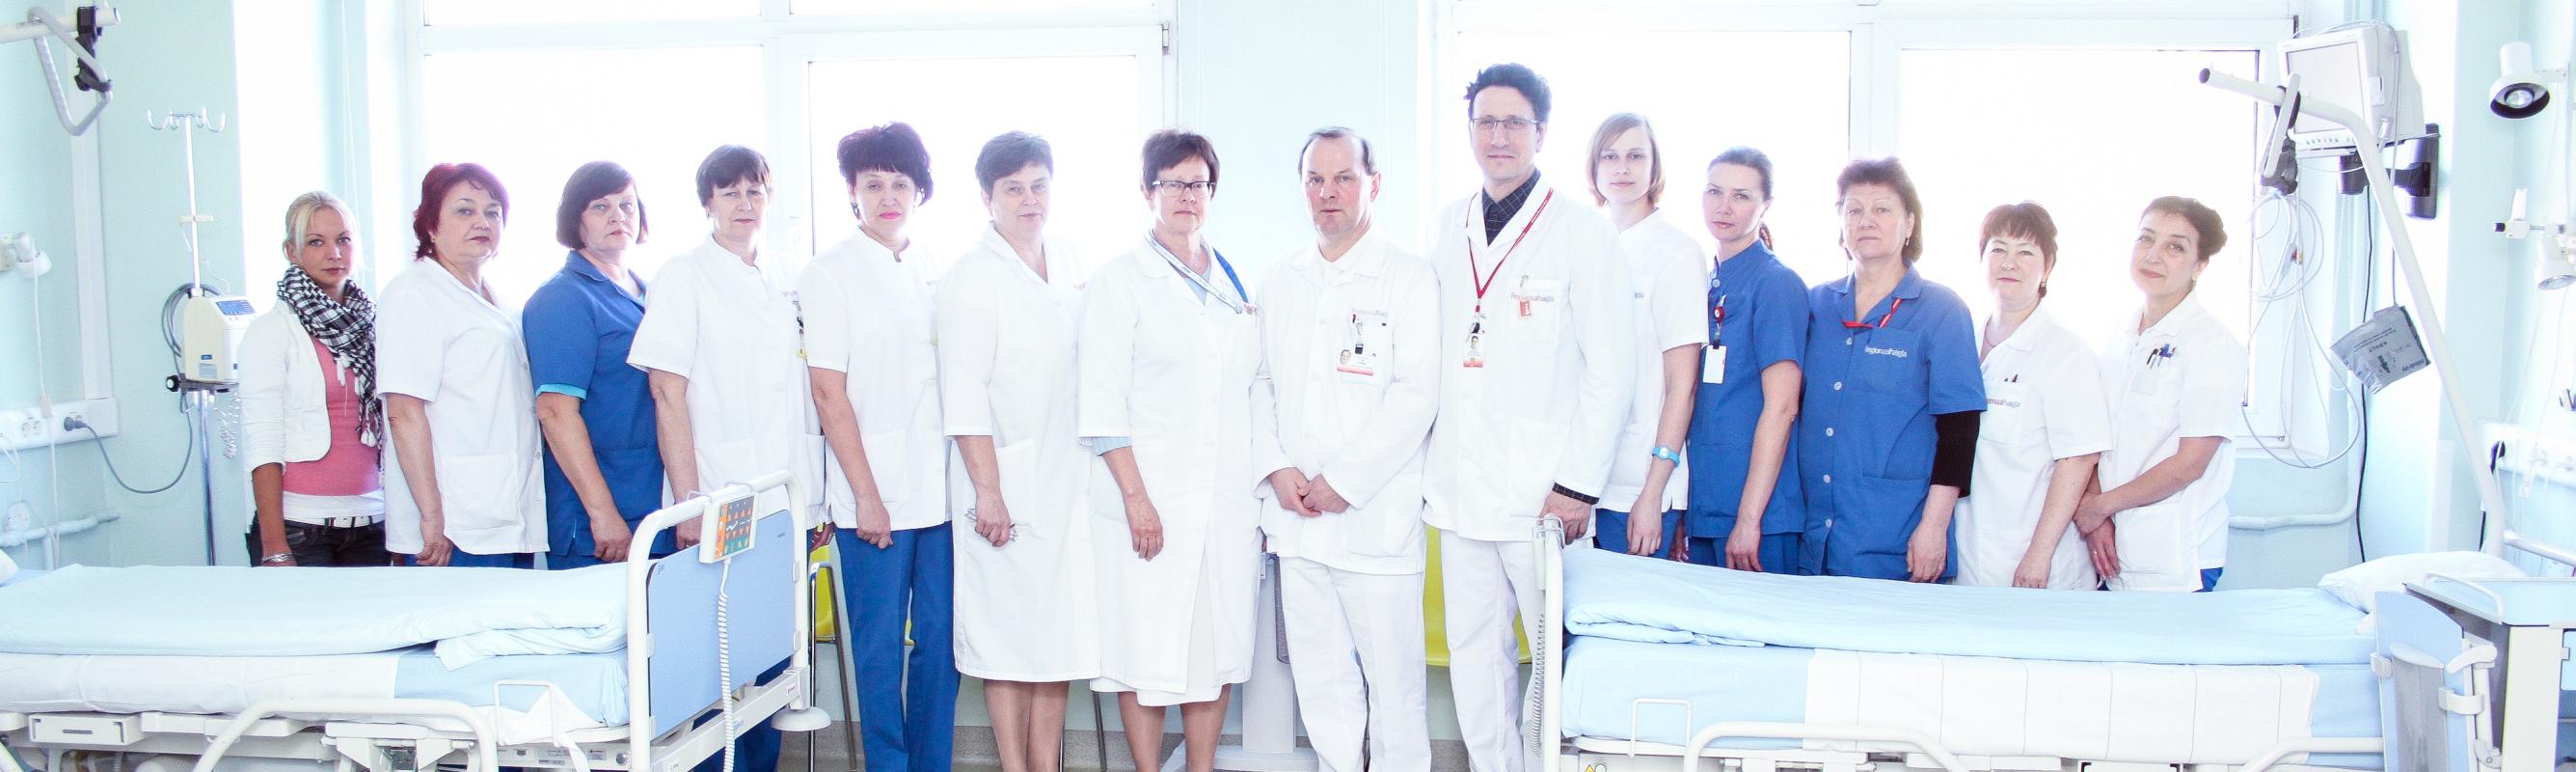 II ortopeedia osakond. Foto: Silver Raidla